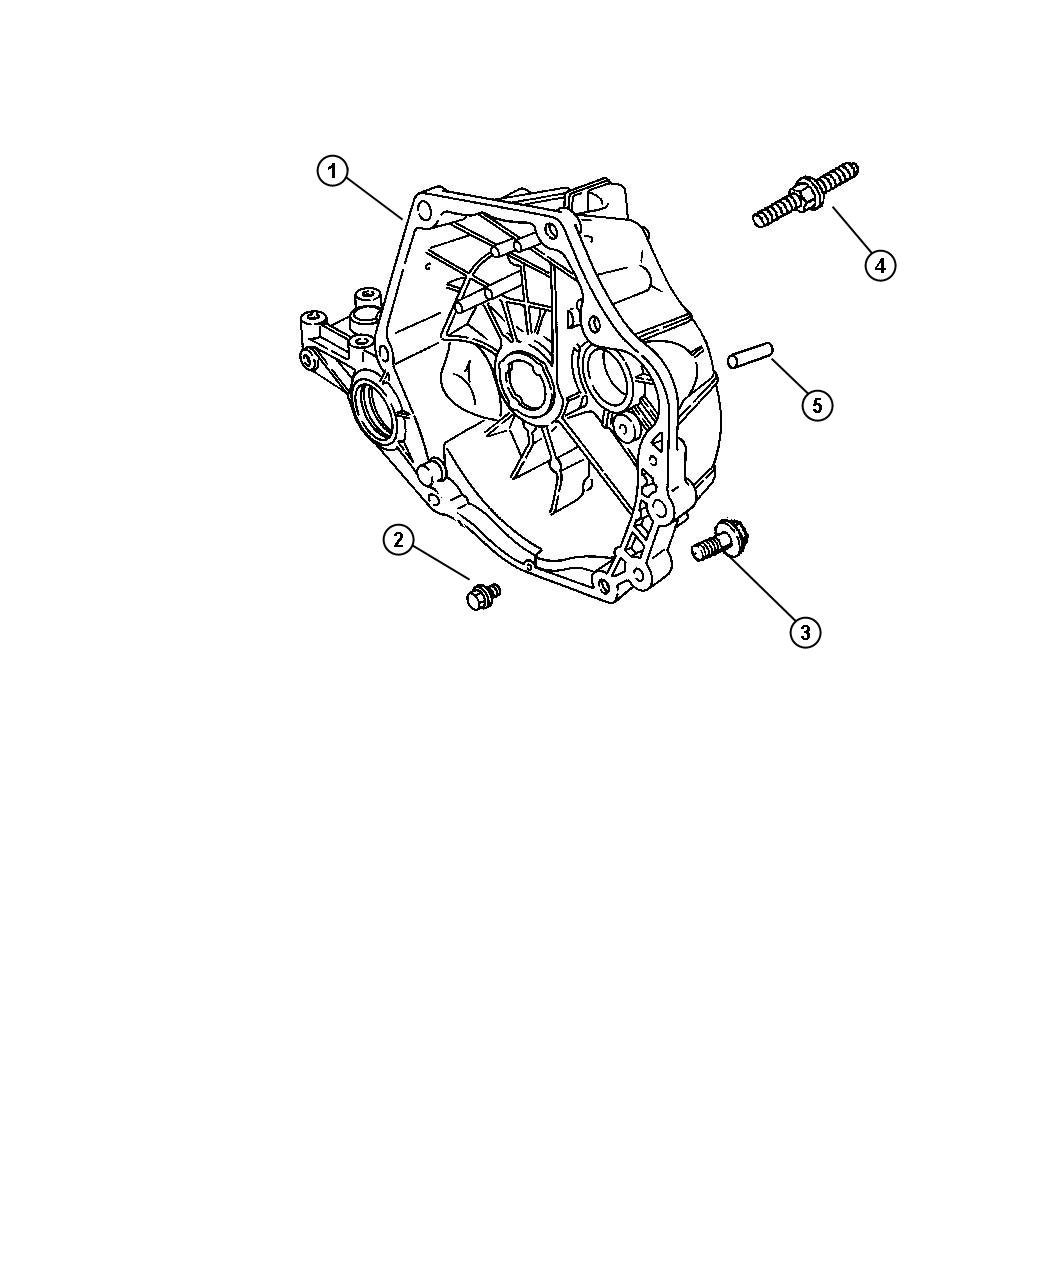 Chrysler Sebring Dowel, dowel pin. Block to clutch housing